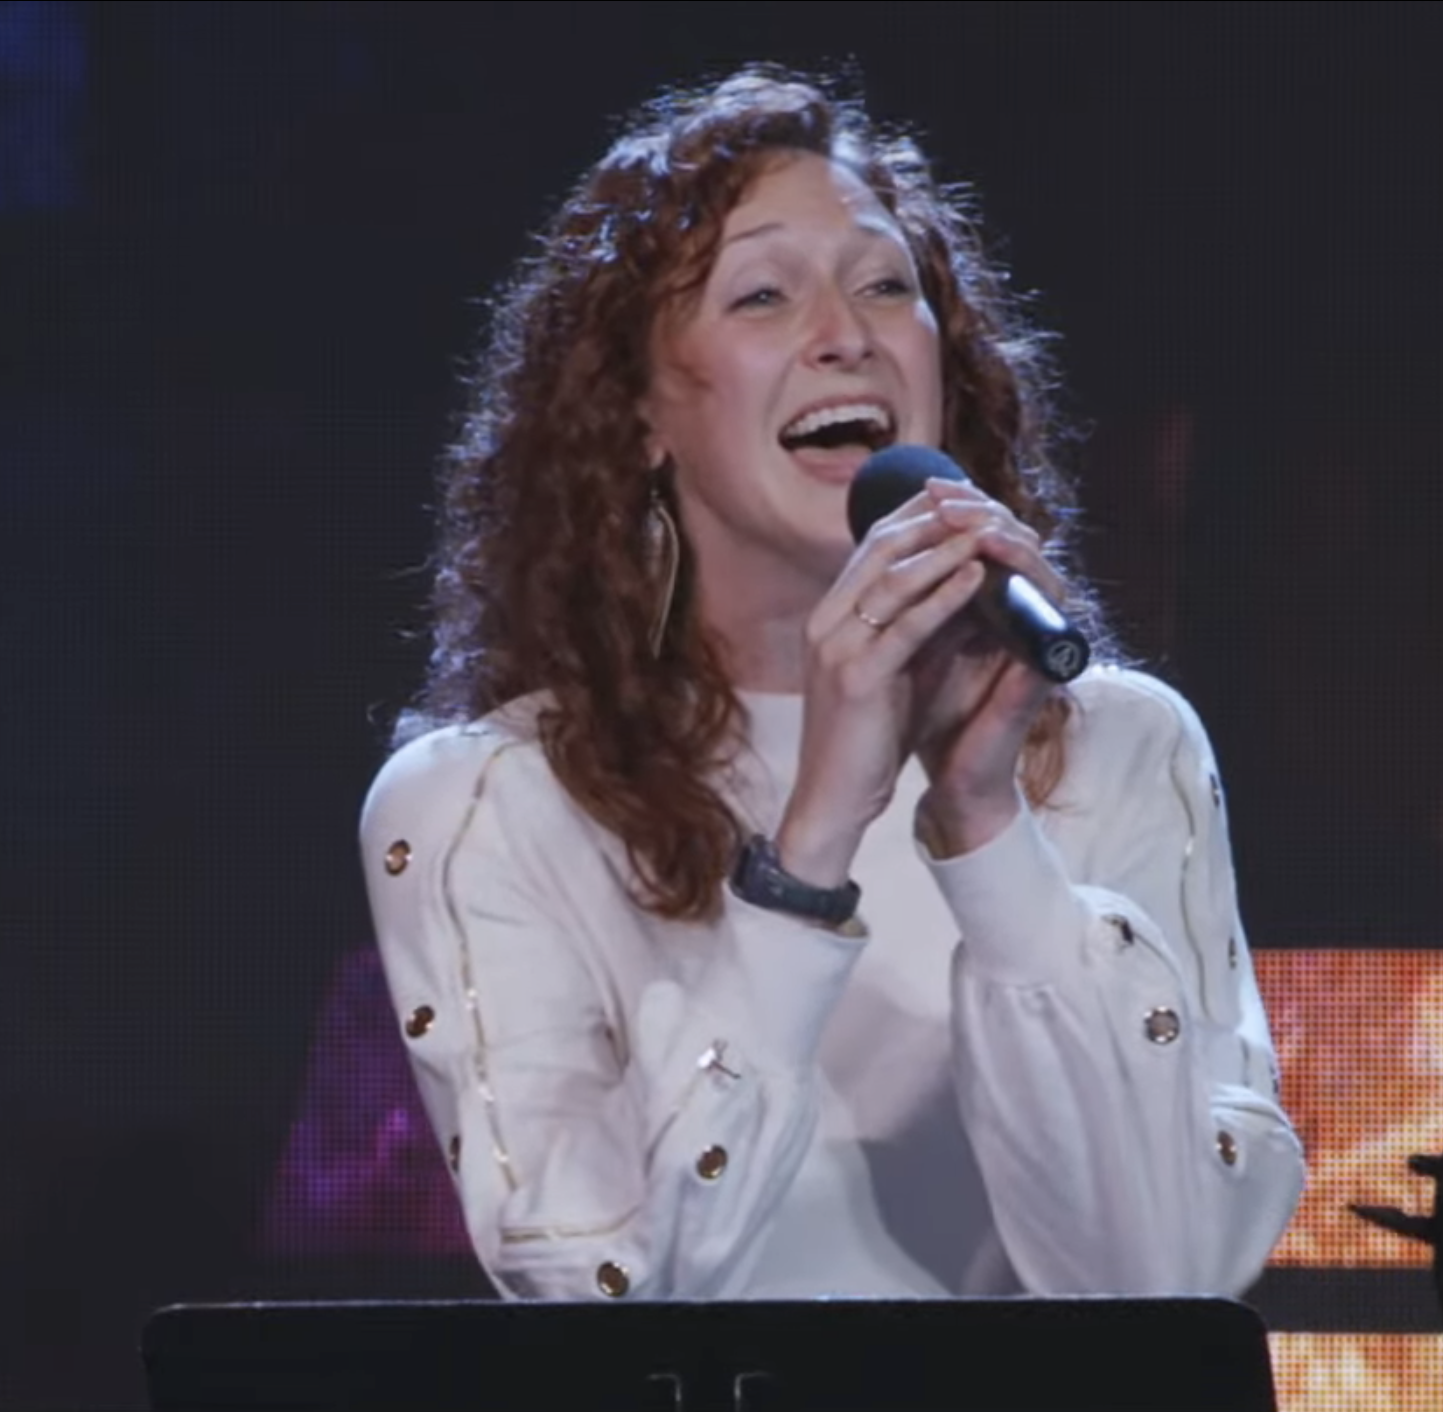 Katie Borden leads worship